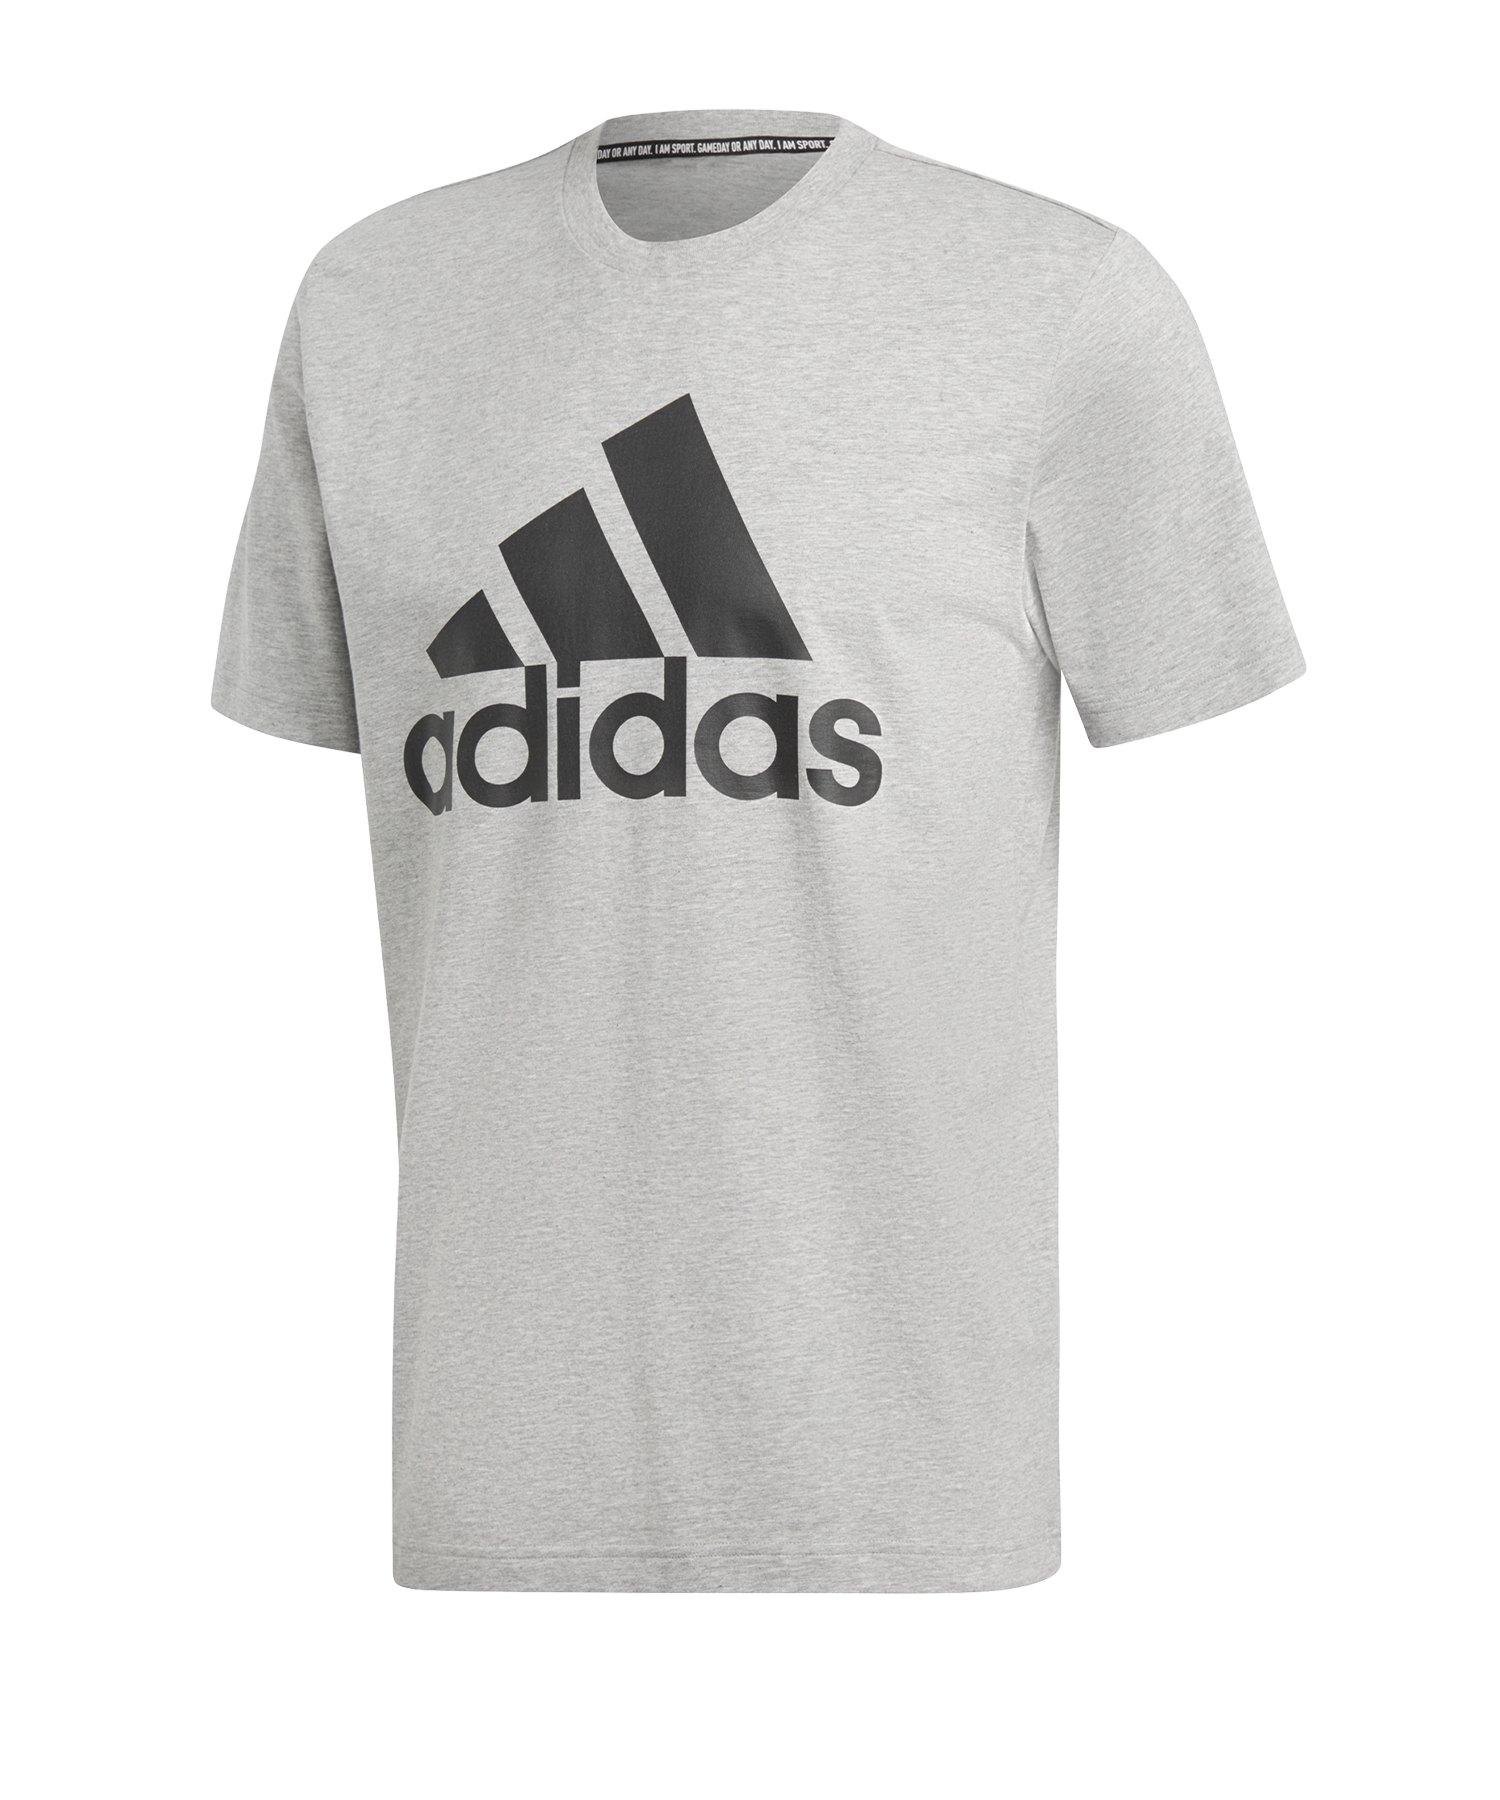 adidas MH Badge of Sport T-Shirt Grau Schwarz - grau